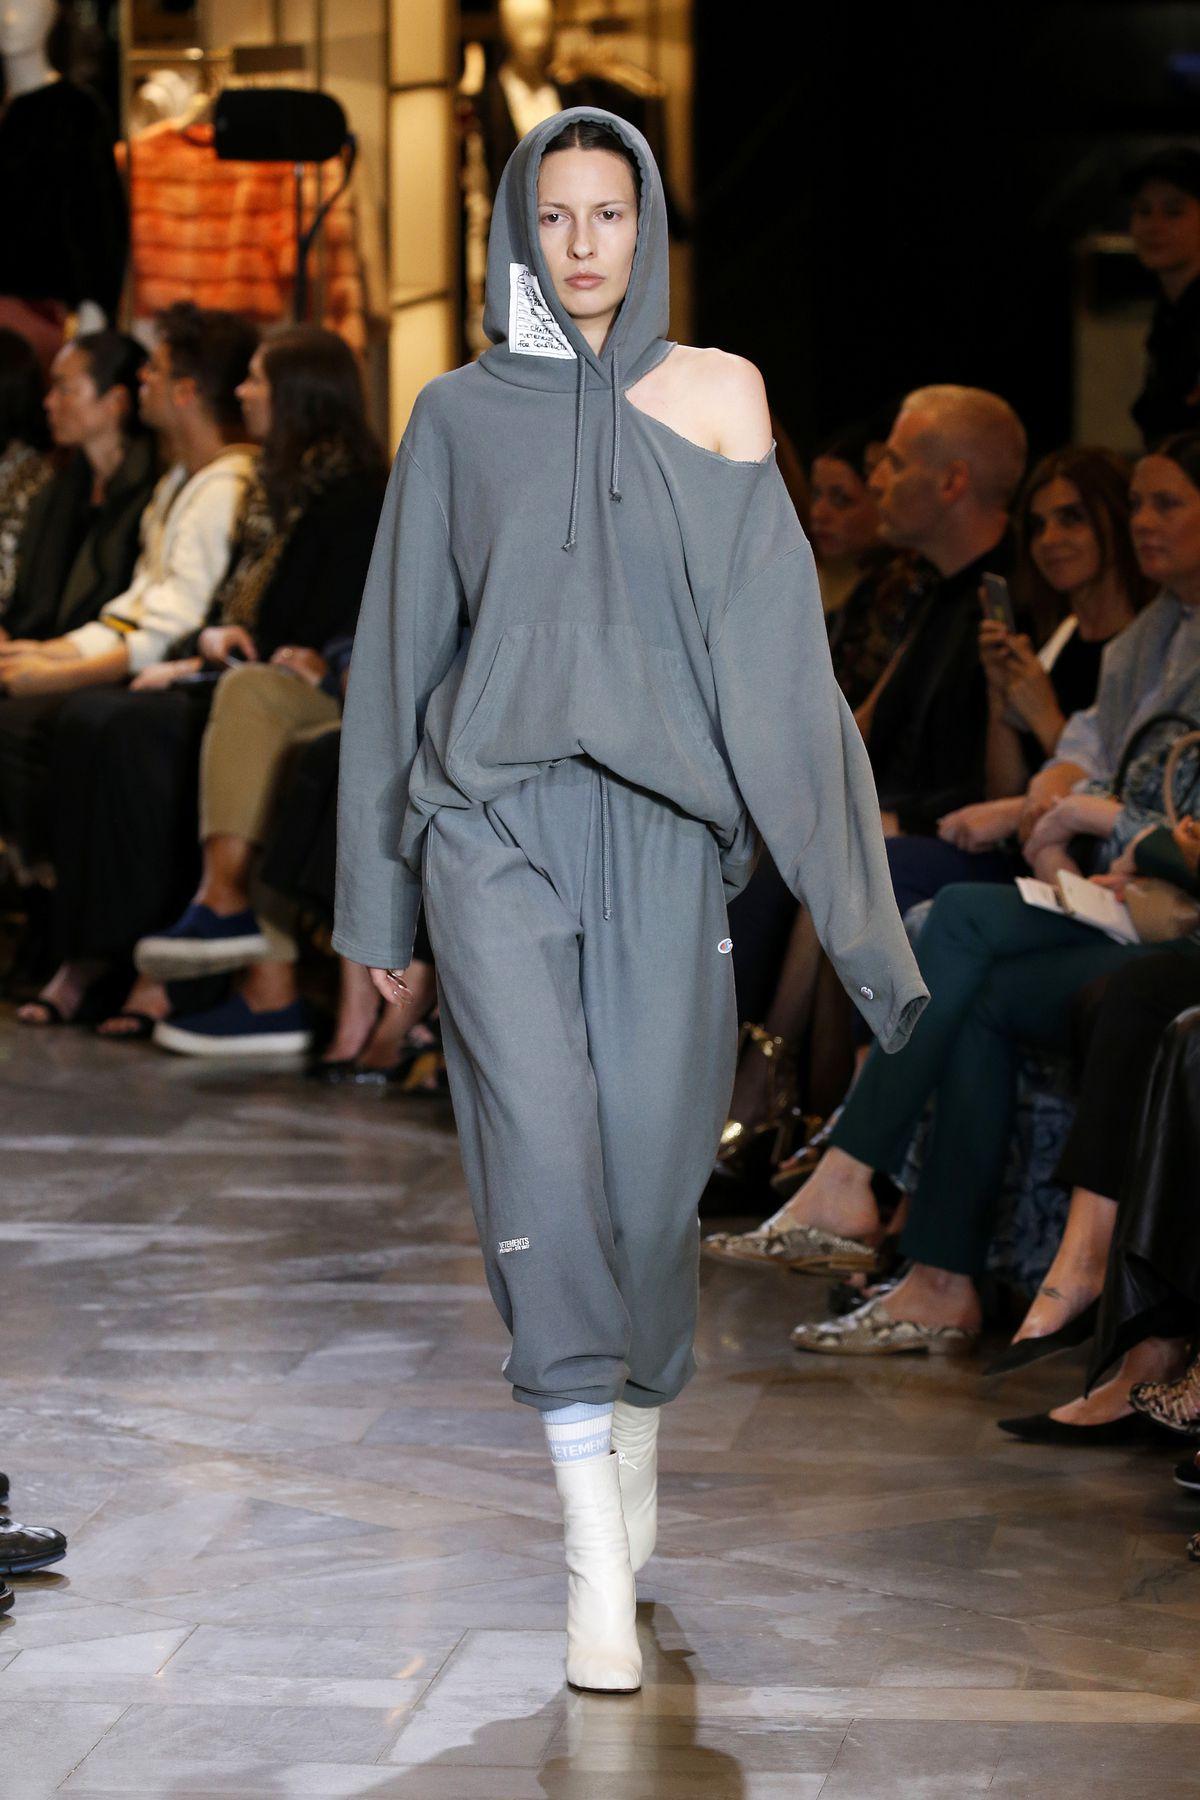 Model walks runway wearing Vetements x Champion gray outfit